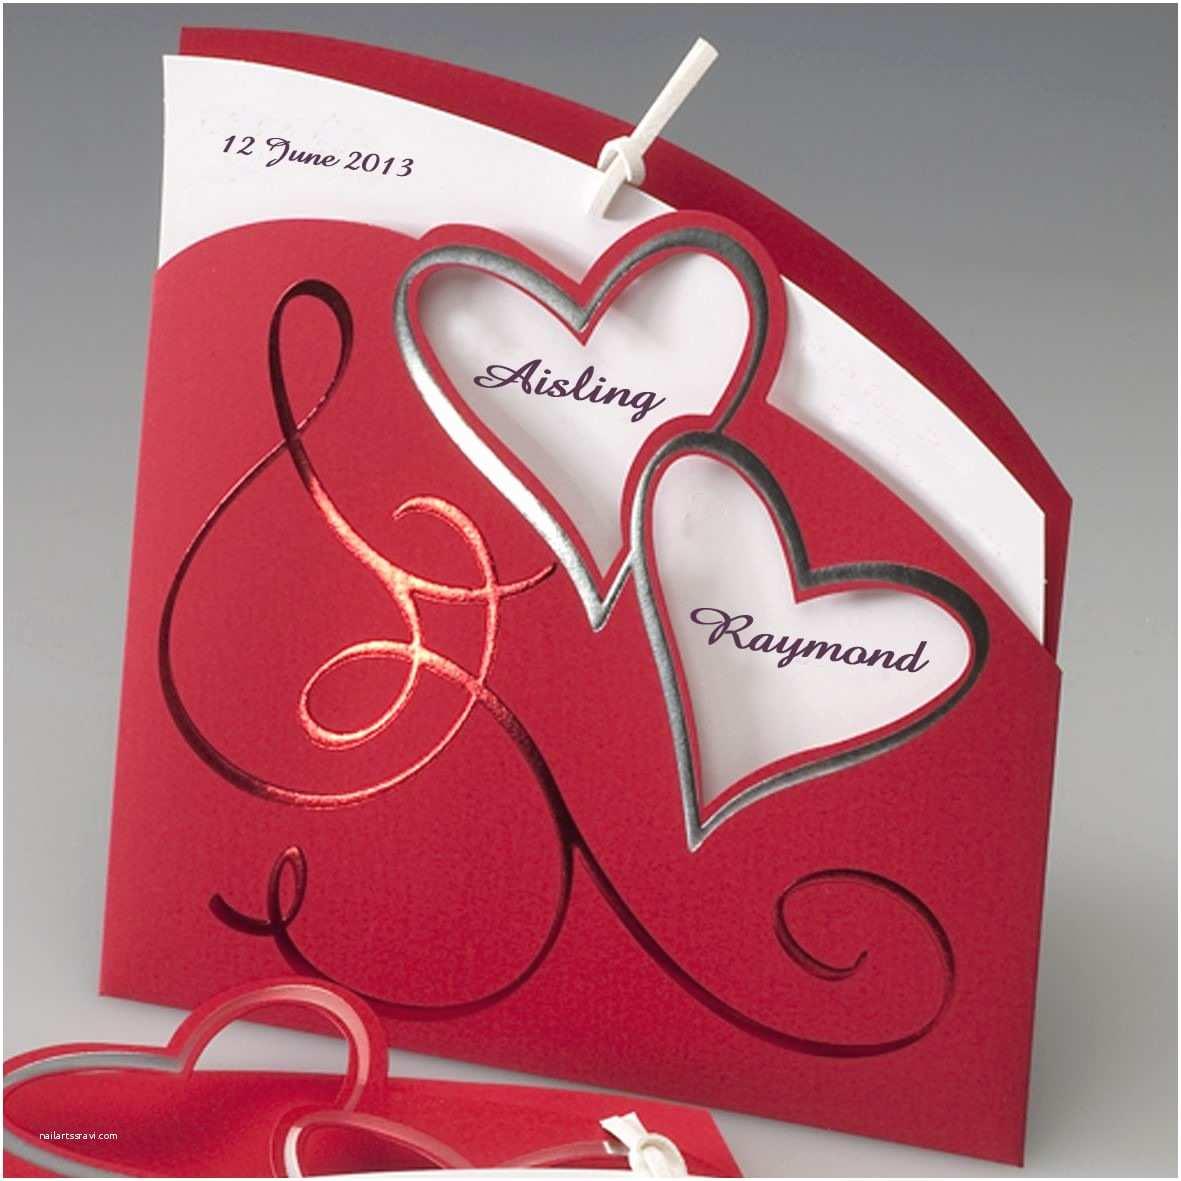 Wedding Invitation Design Images Wedding Card Invitation Free Wedding Invitations Cards